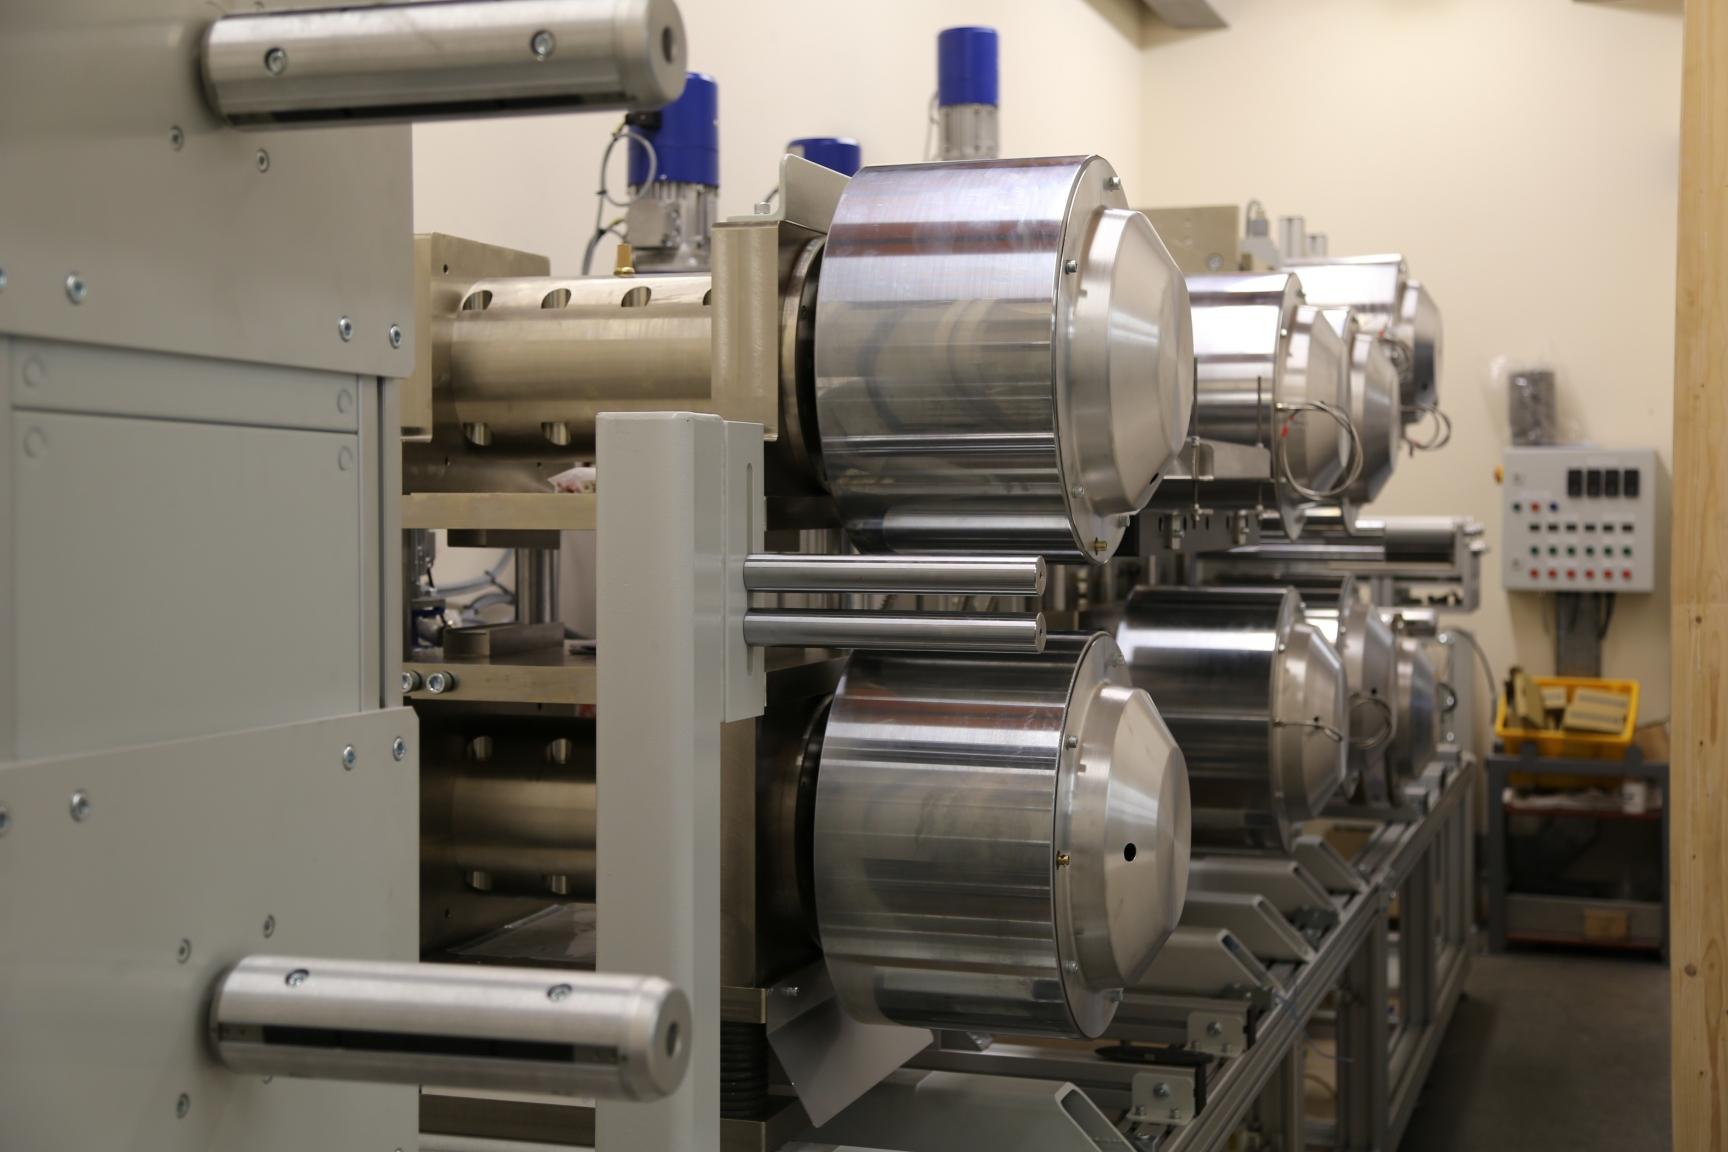 Cygnet Texkimp - Thermoplastic Labline - 1